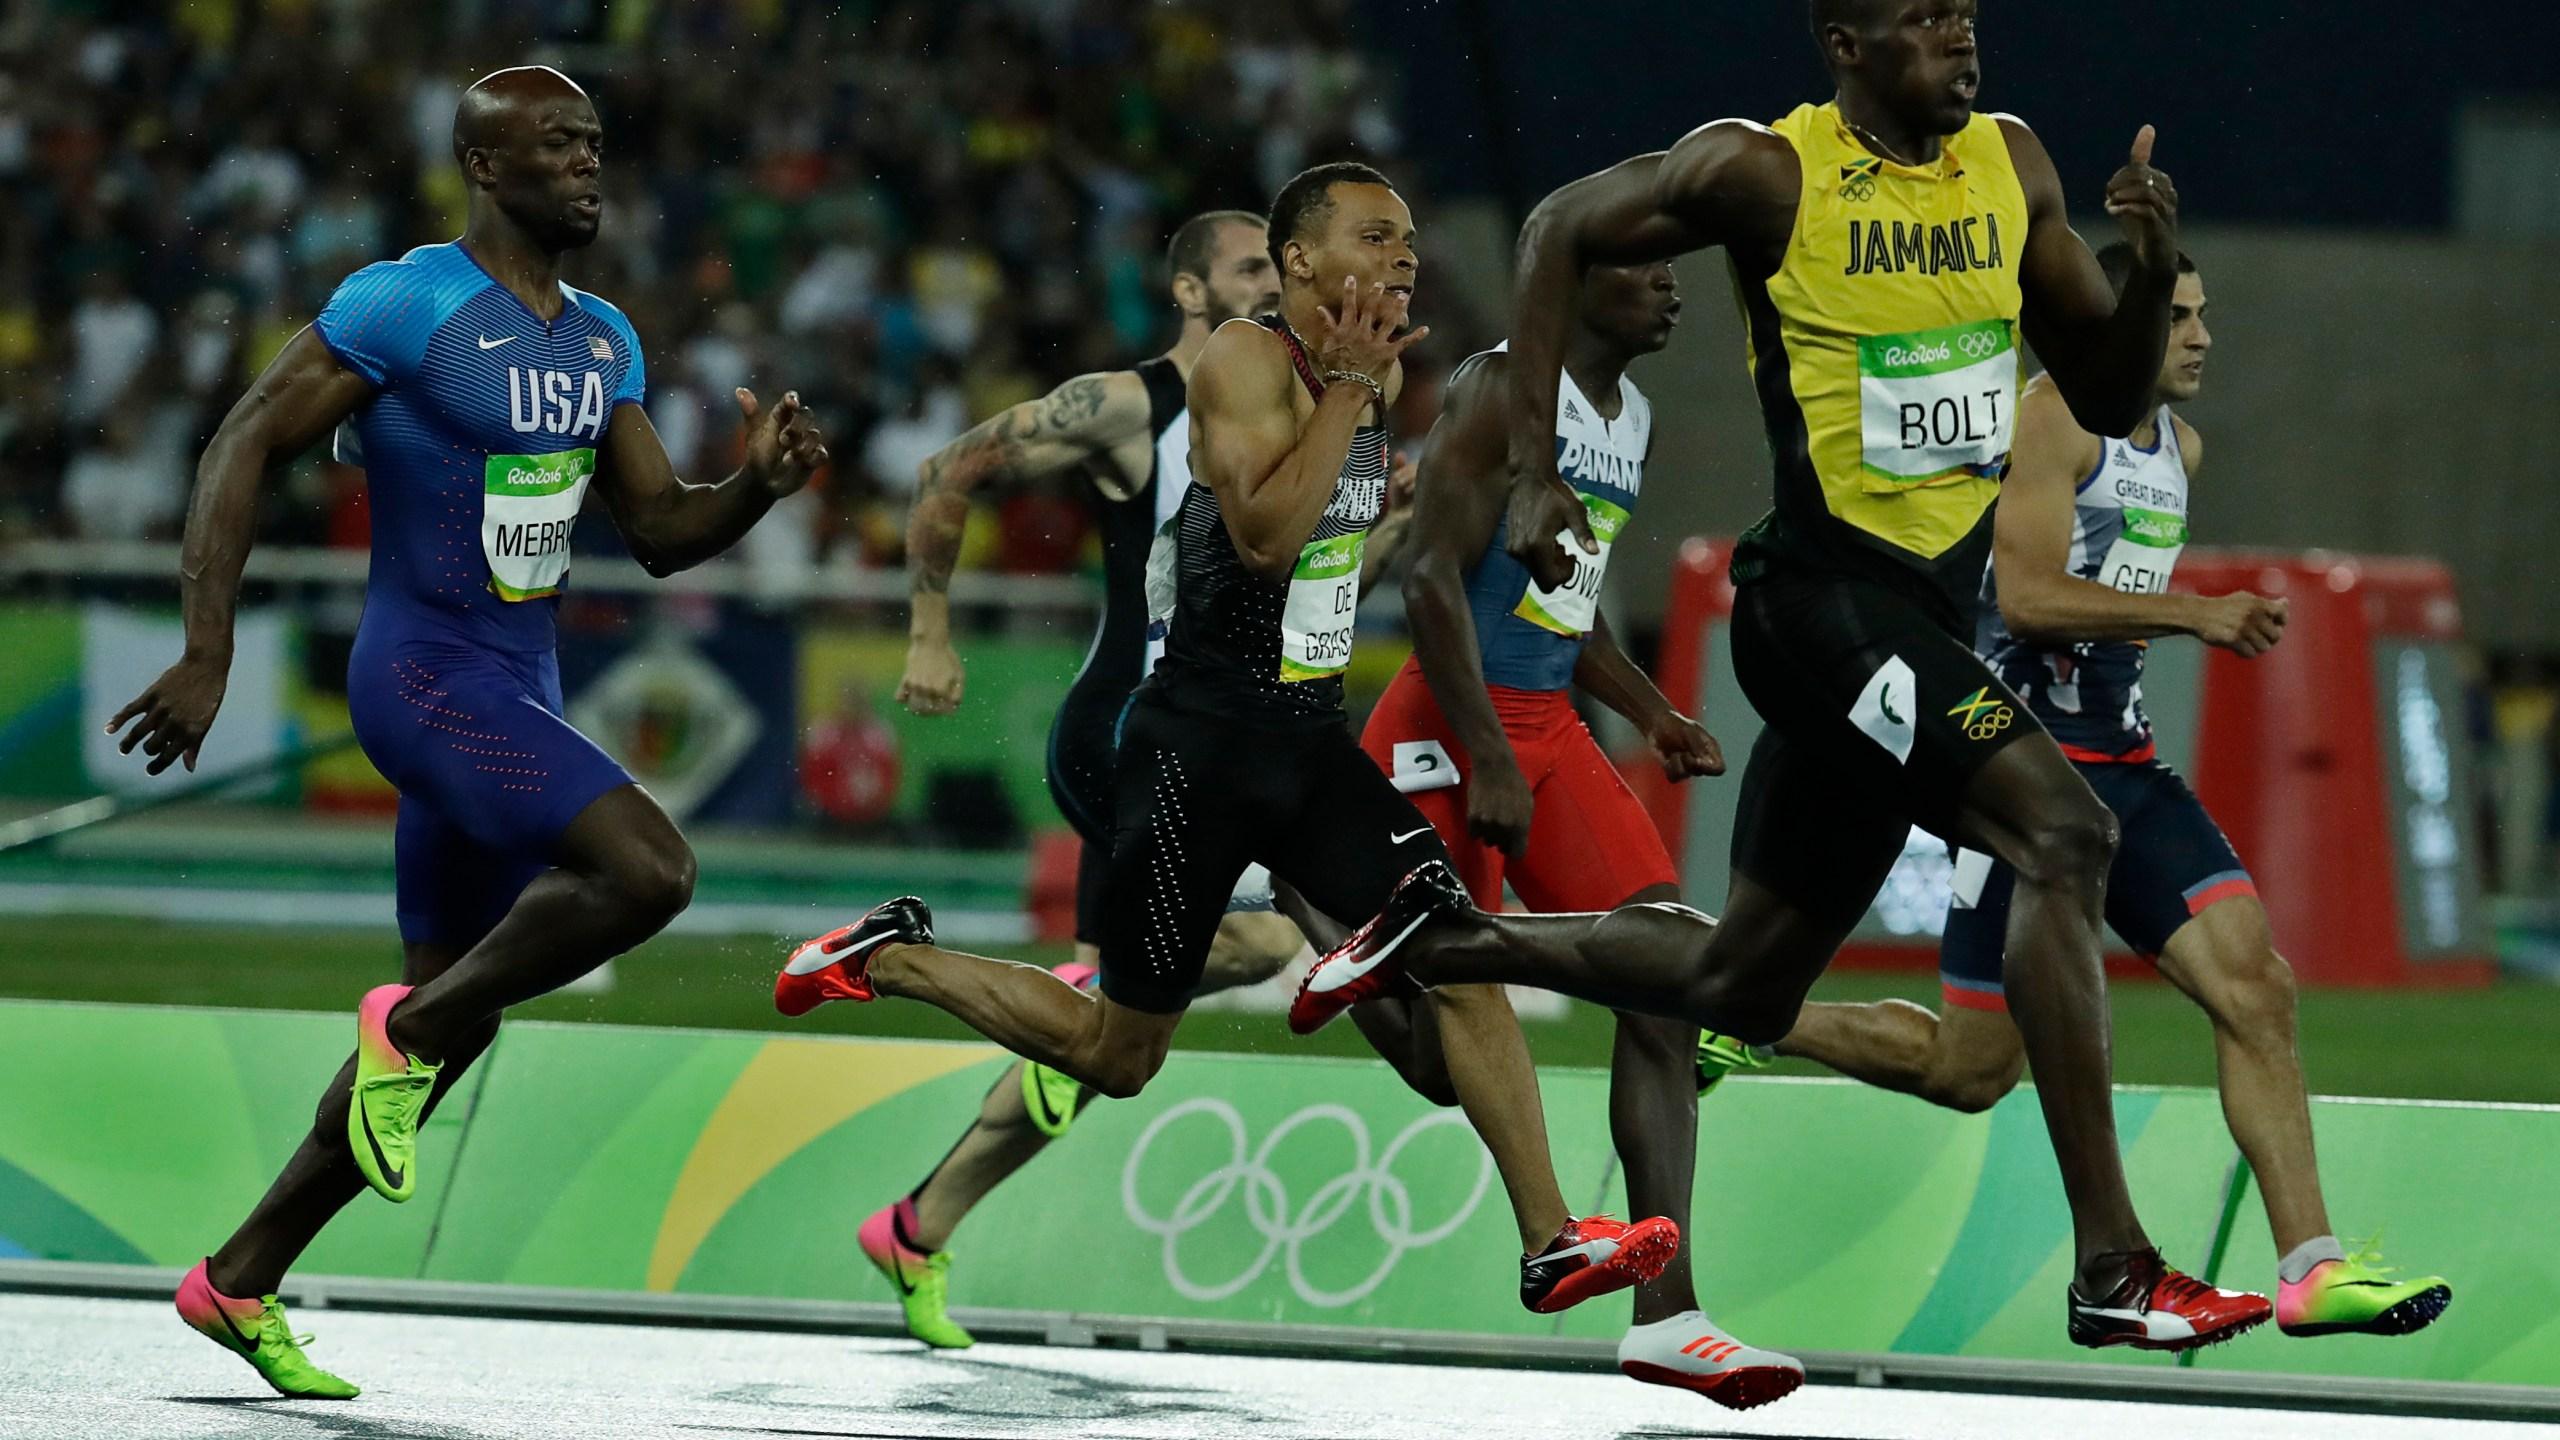 Rio Olympics Athletics_218206